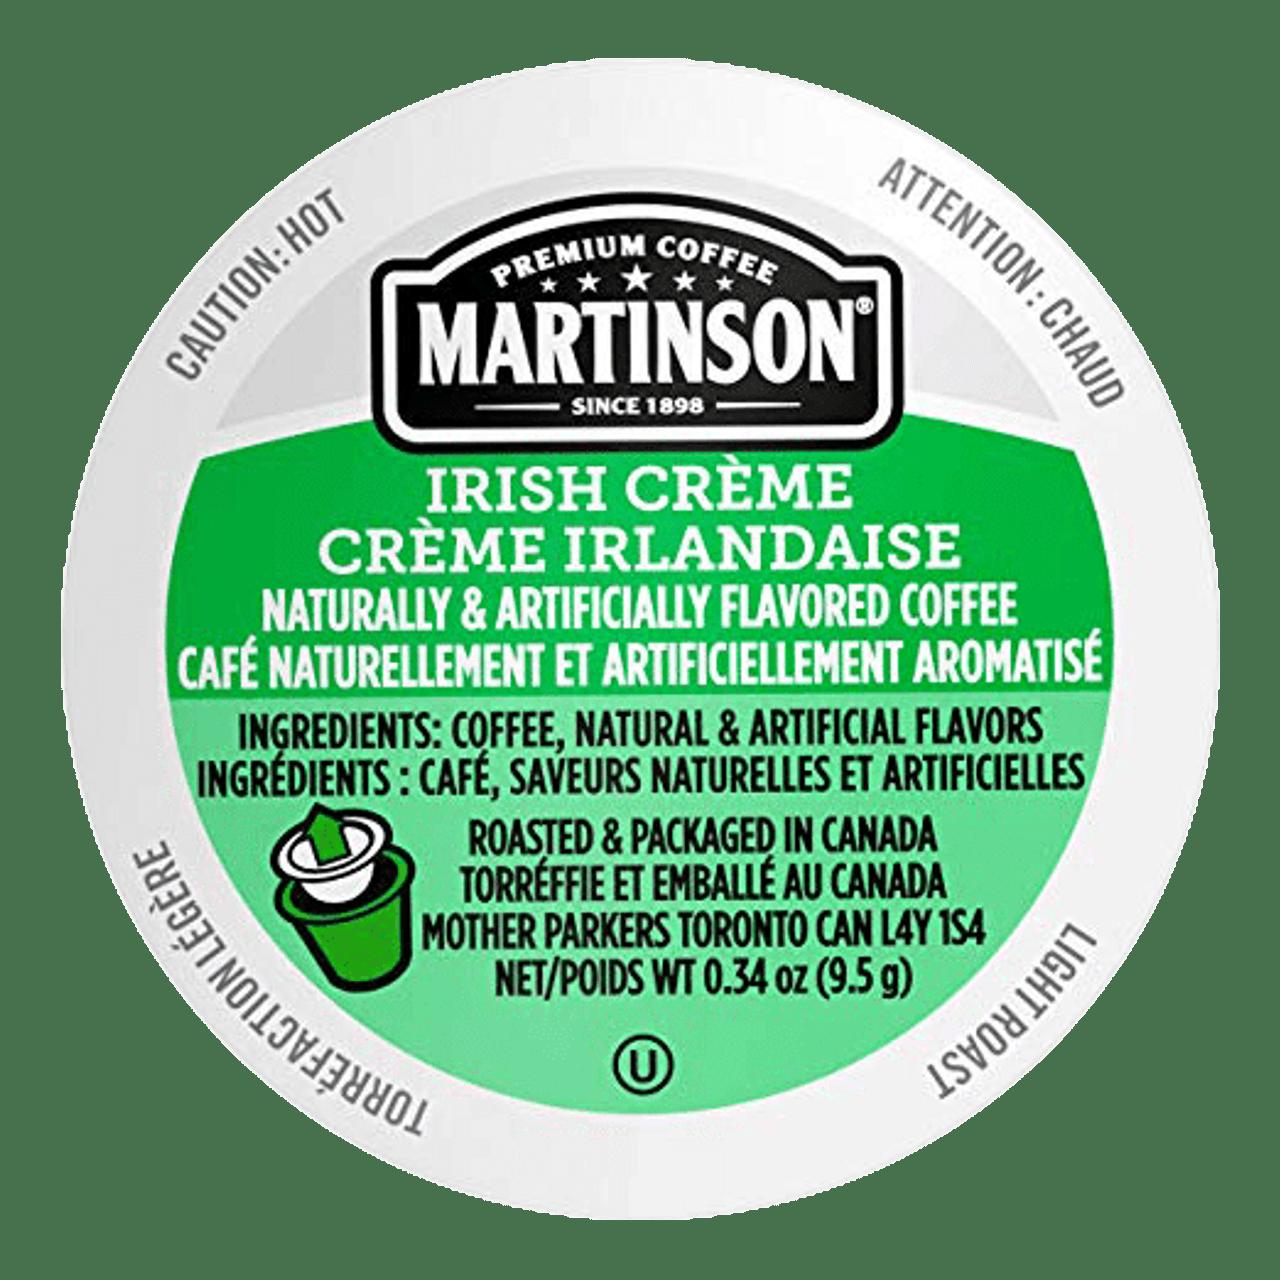 Irish Cream Flavored Coffee by Martinson